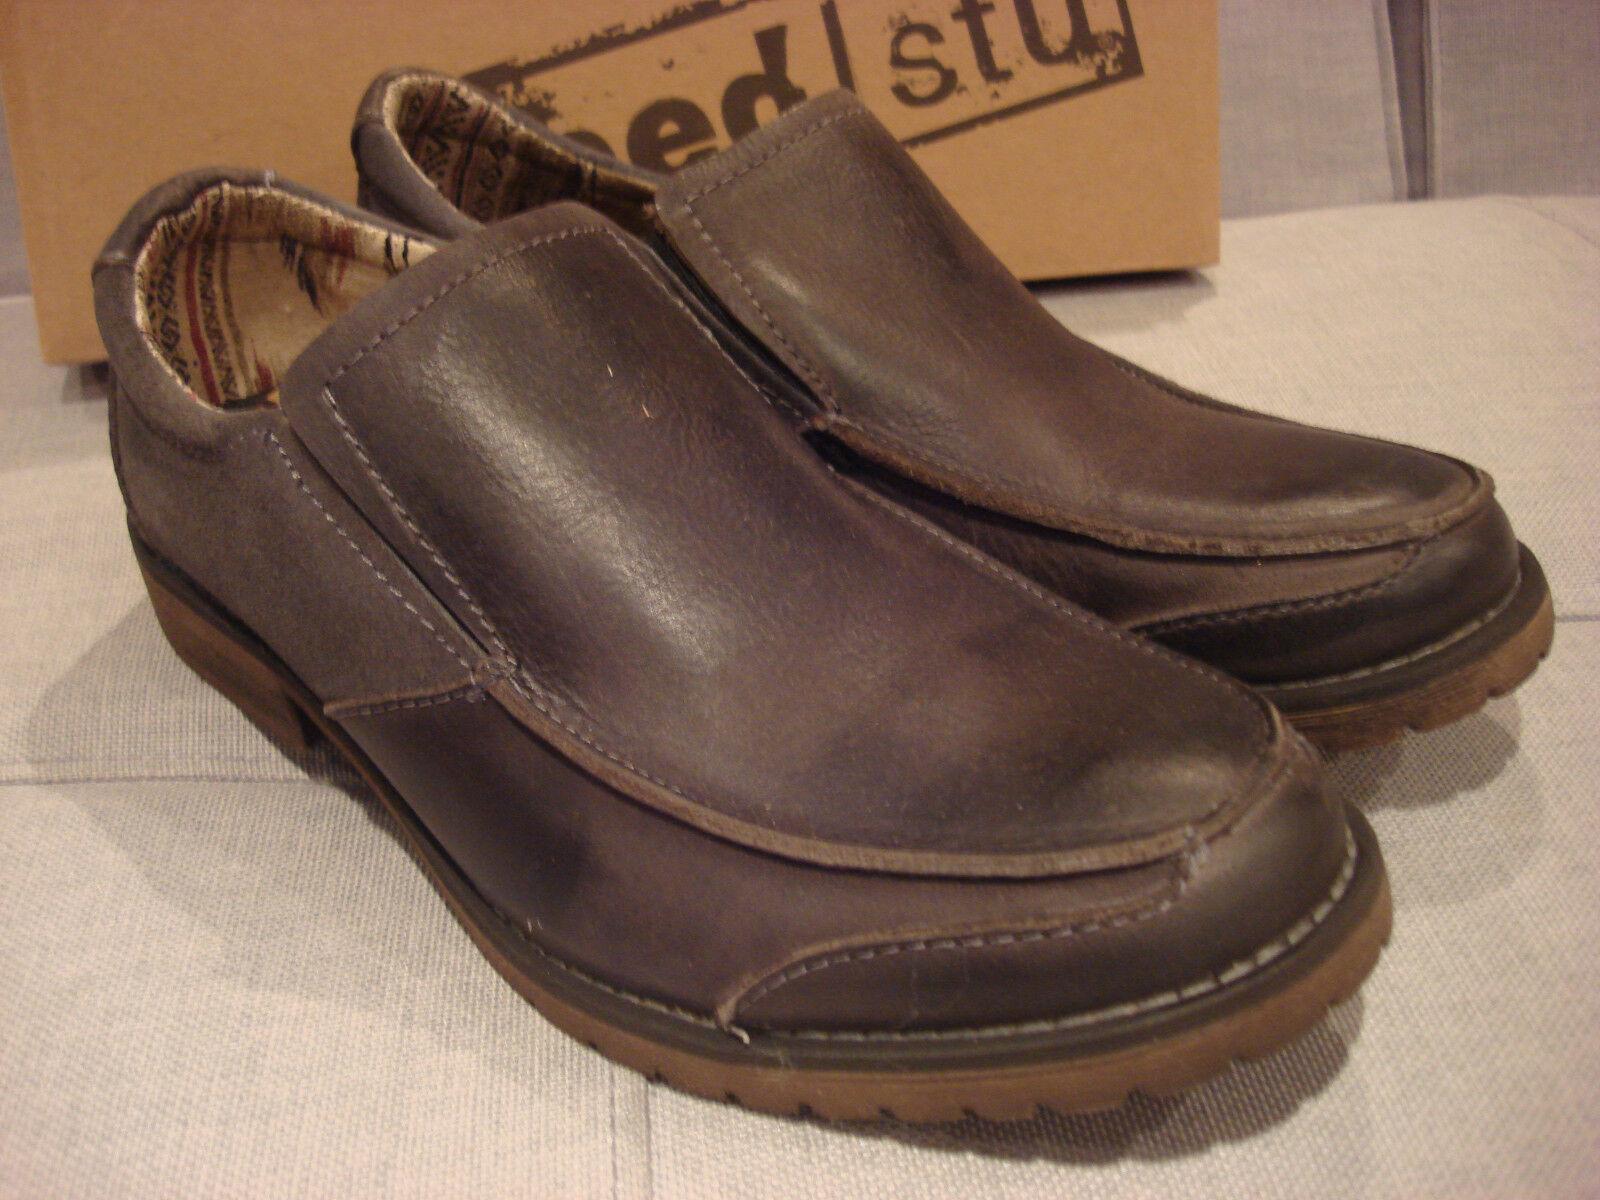 BED STU hommes FILLMORE 420211 noir vertLAND CHAR gris chaussures Taille 11 - NEW